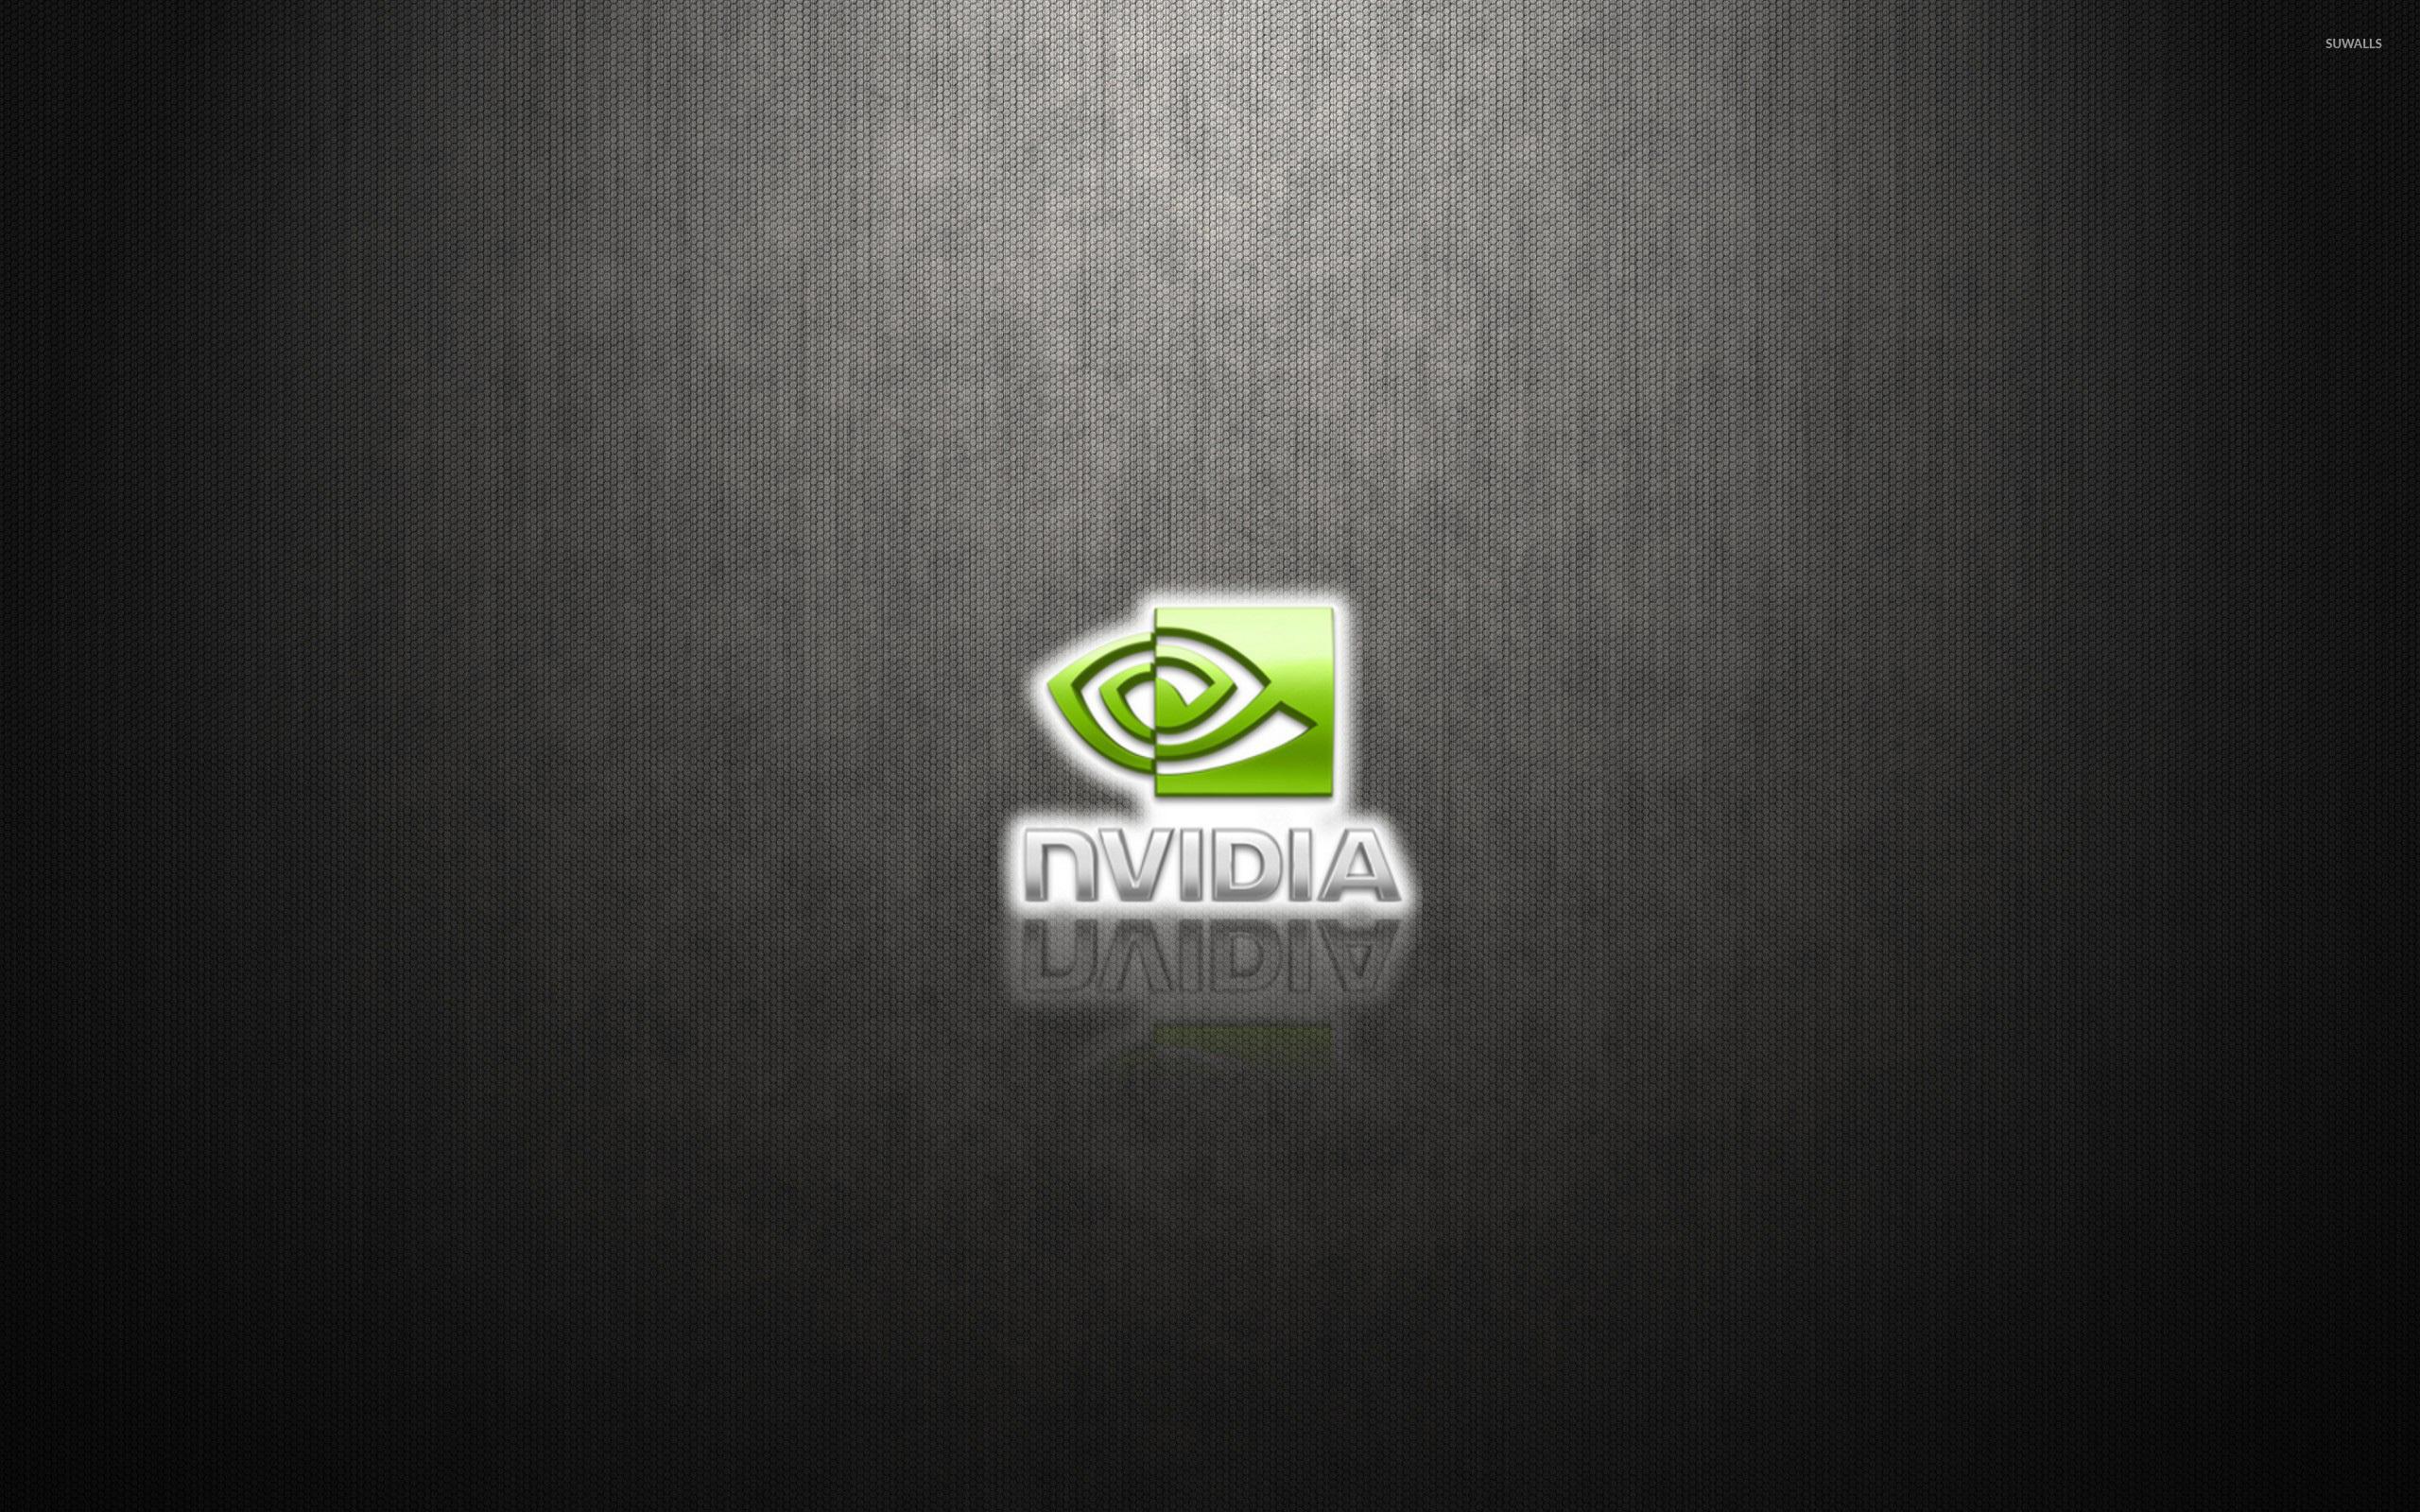 45 Nvidia Wallpaper 3840x2160 On Wallpapersafari